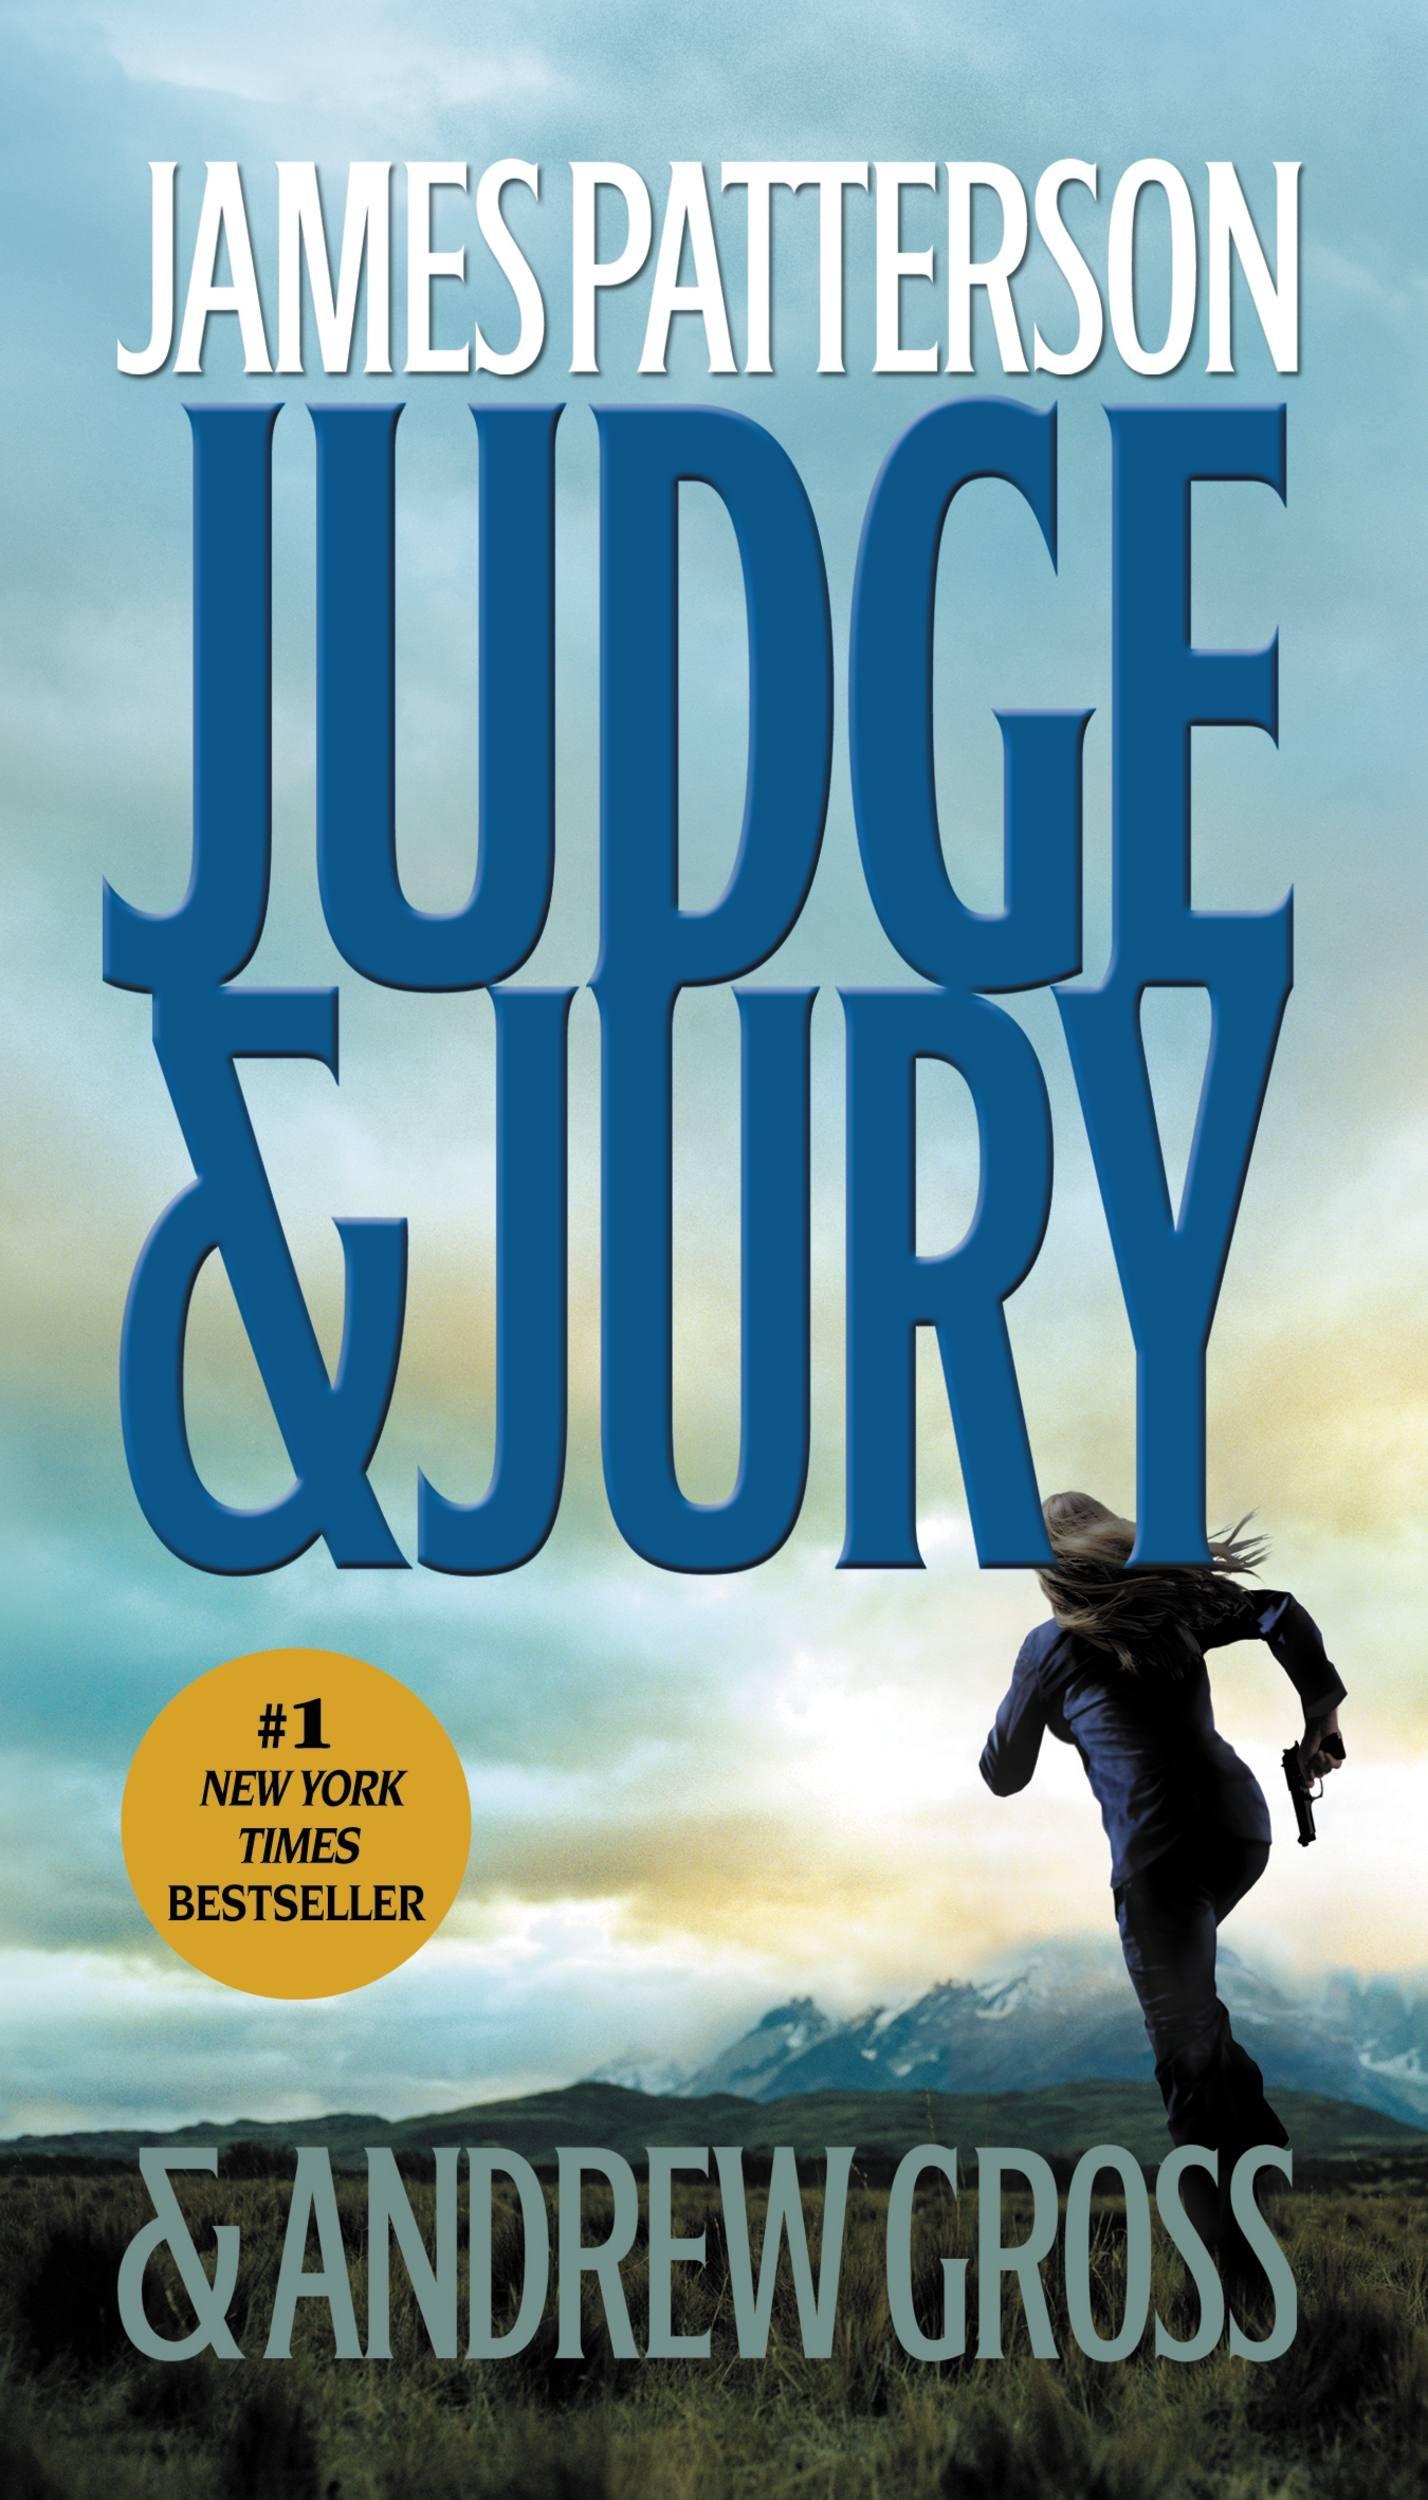 Judge & Jury by James Patterson | Hachette Book Group